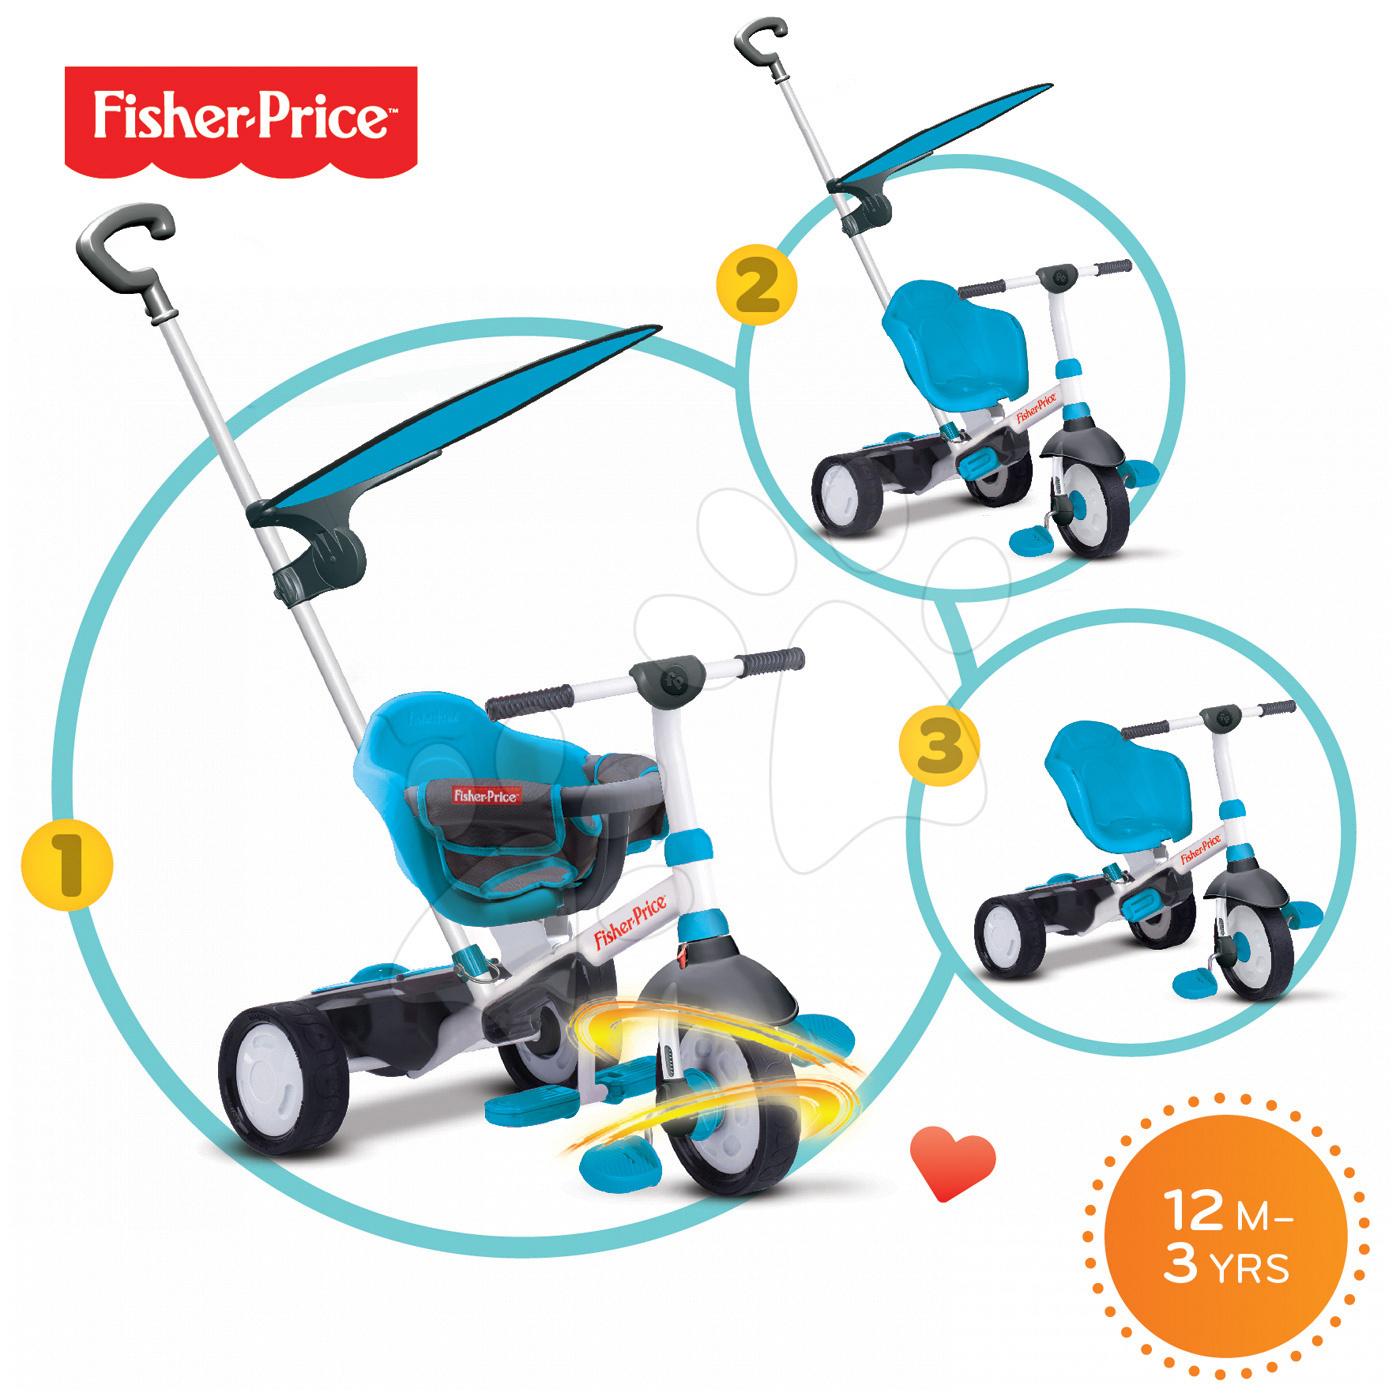 Trojkolky od 10 mesiacov - Trojkolka Fisher-Price Charm Plus Touch Steering smarTrike modrá od 12 mes